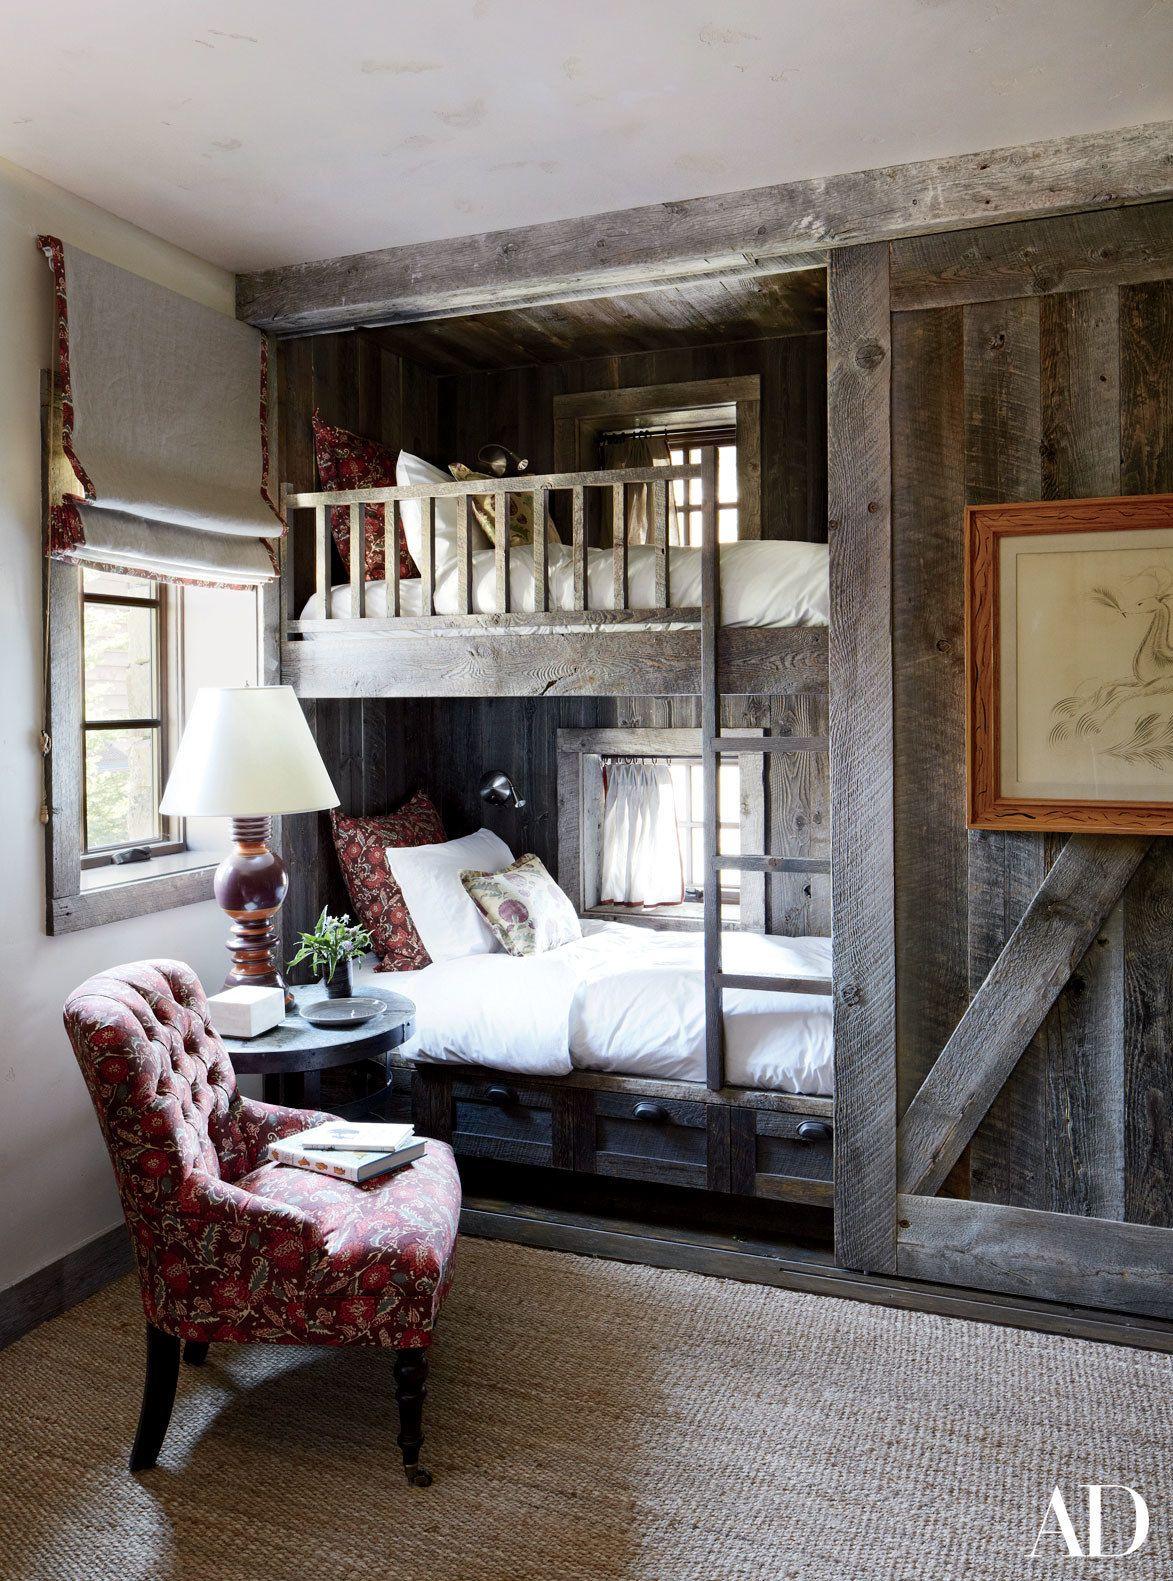 interior design trends 2016 - 1000+ images about Interior Design rends 2016 on Pinterest ...